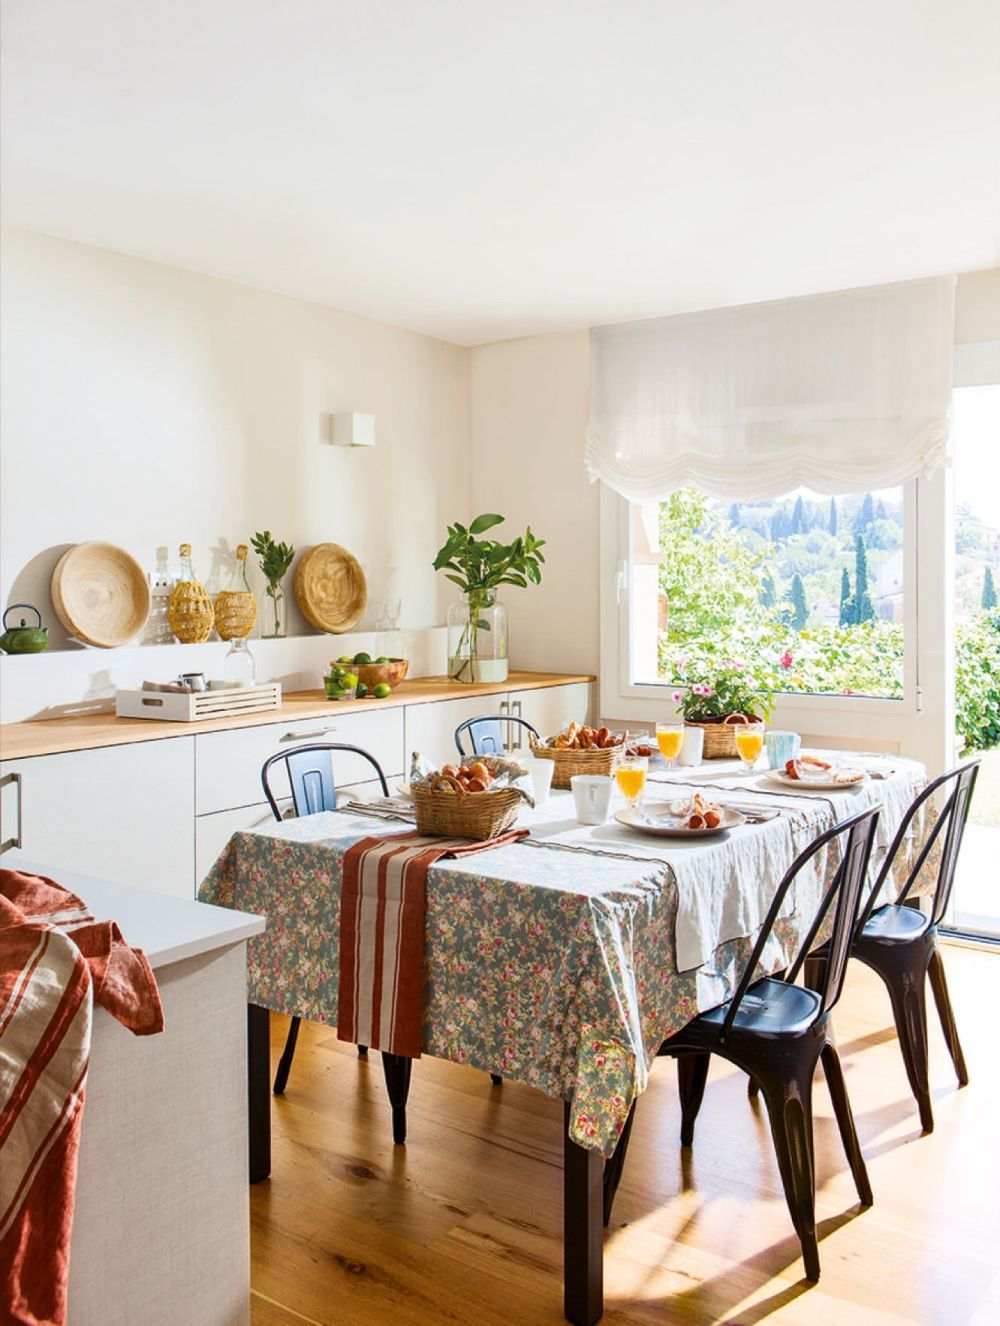 adelaparvu.com despre casa cu gradina, accente marine, designer Jeanette Dresing, Foto Feran Freixa (11)